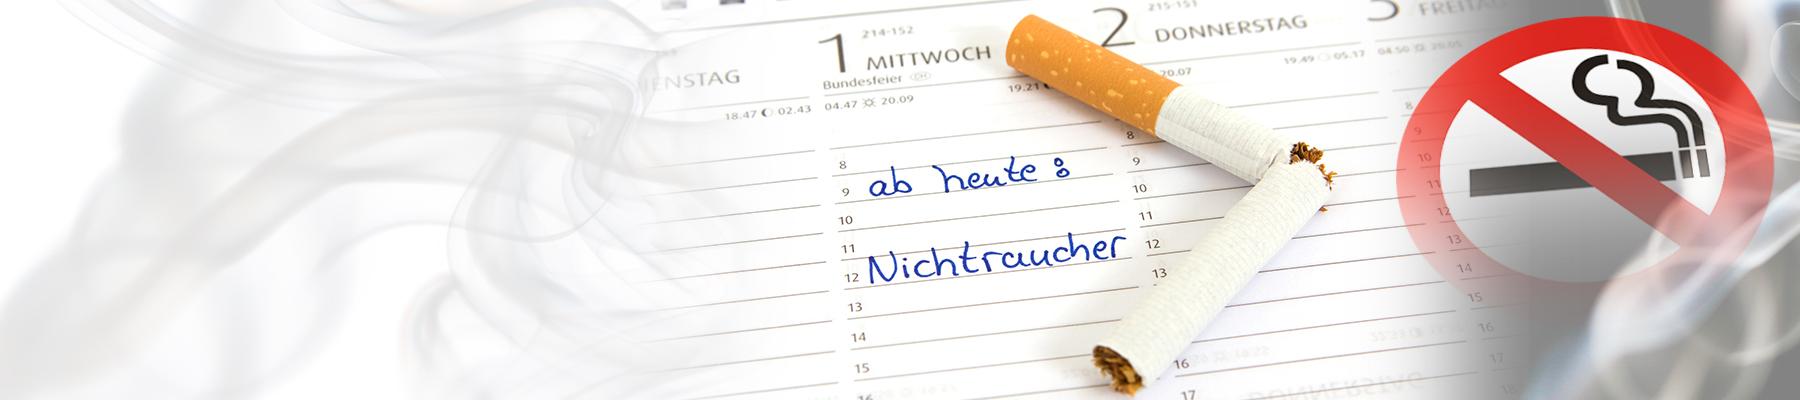 Raucherentwöhnung Hannover, Praxis für Hypnose Hannover Jasmin Thiele